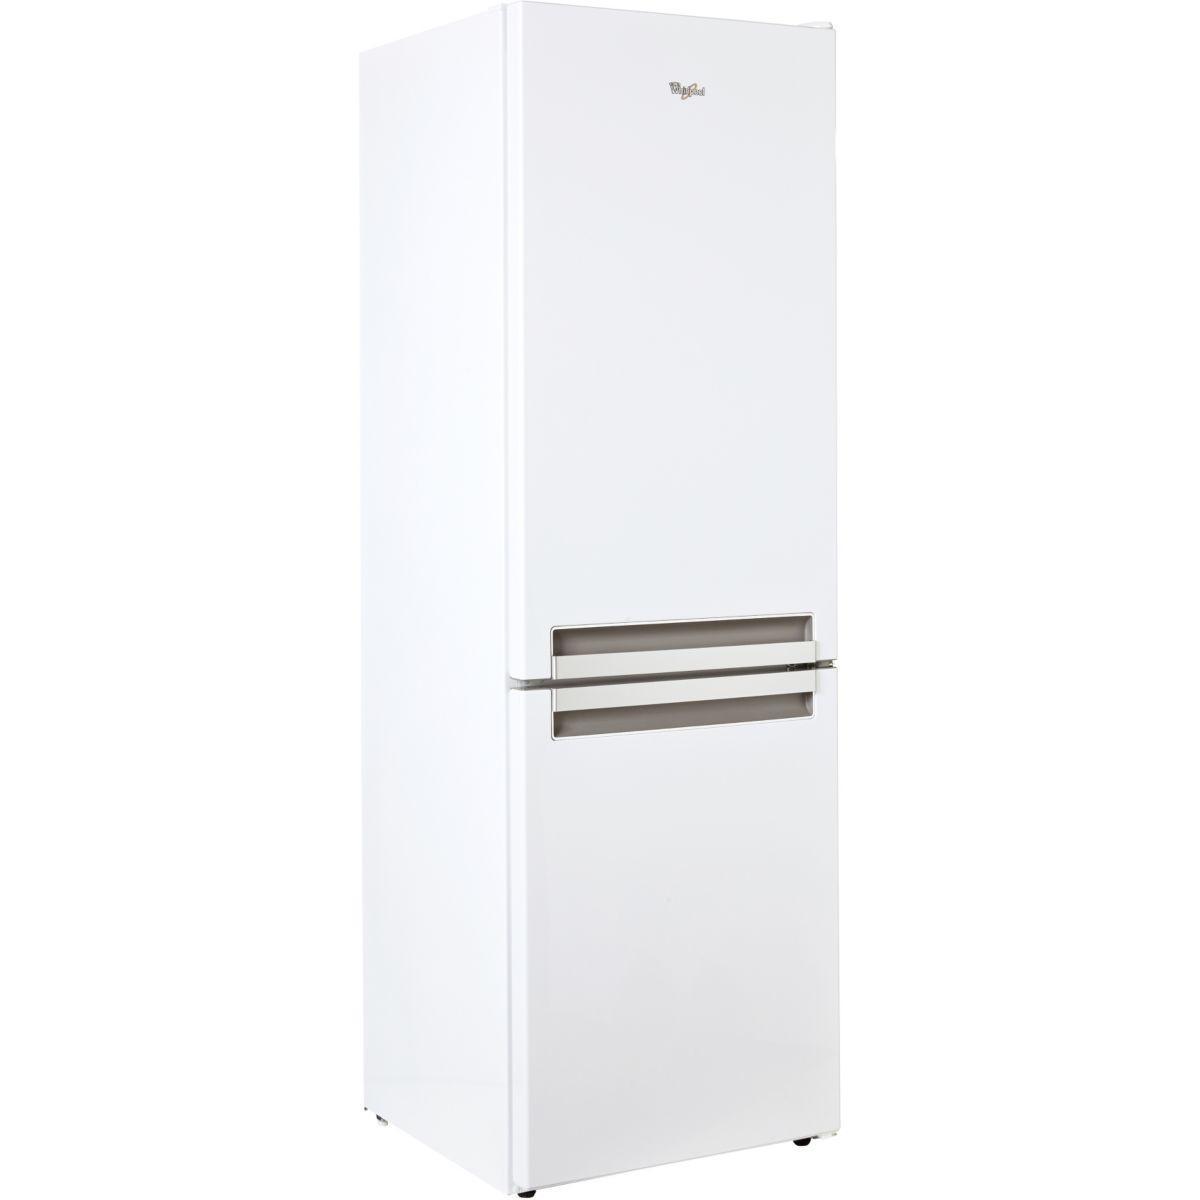 Réfrigérateur combiné WHIRLPOOL BSNF8152W